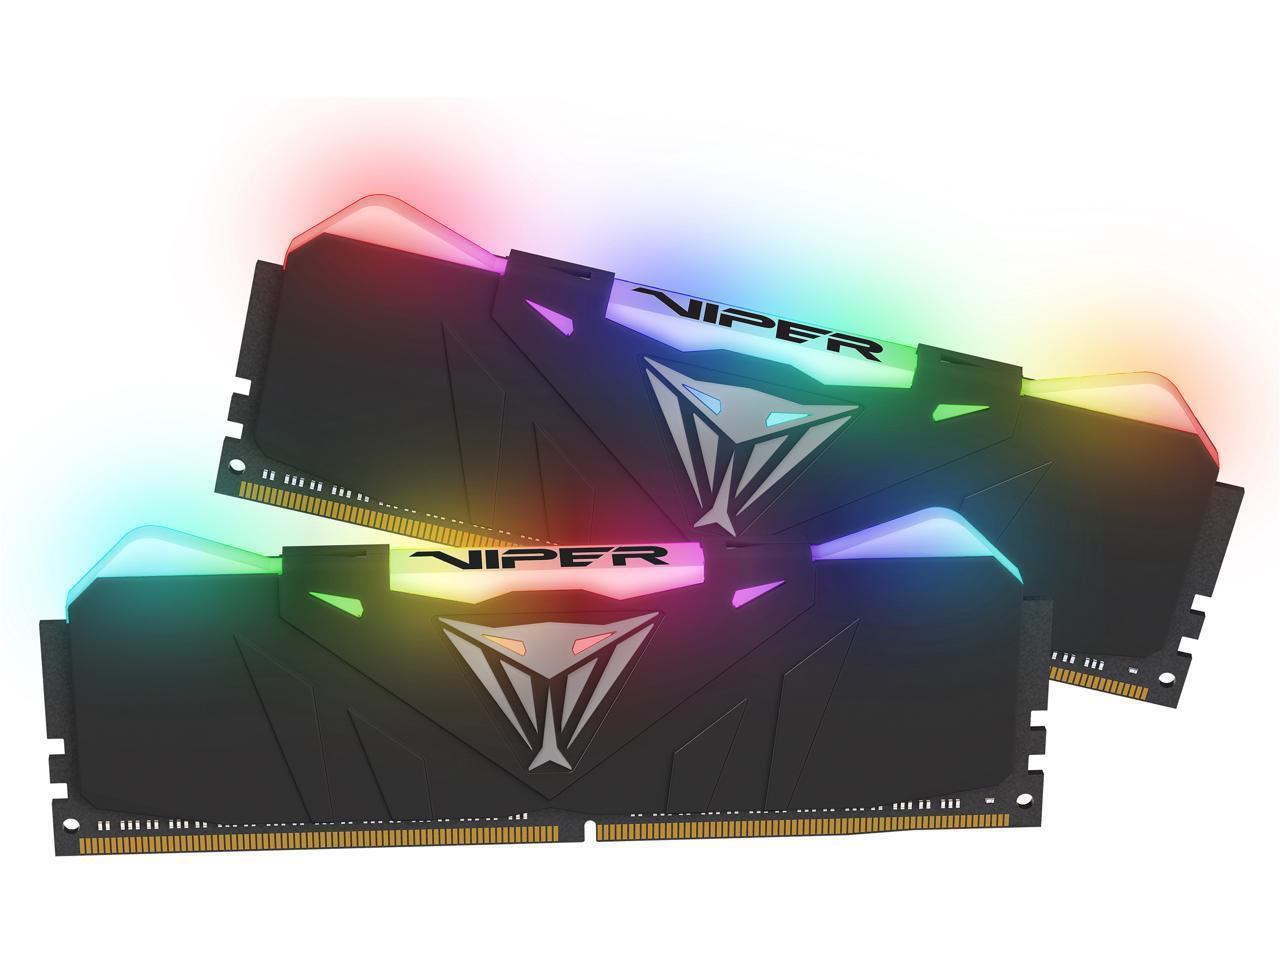 NEW 8Gb Genuine Patriot Memory Card for SAMSUNG S1070 SLR Digital Camera